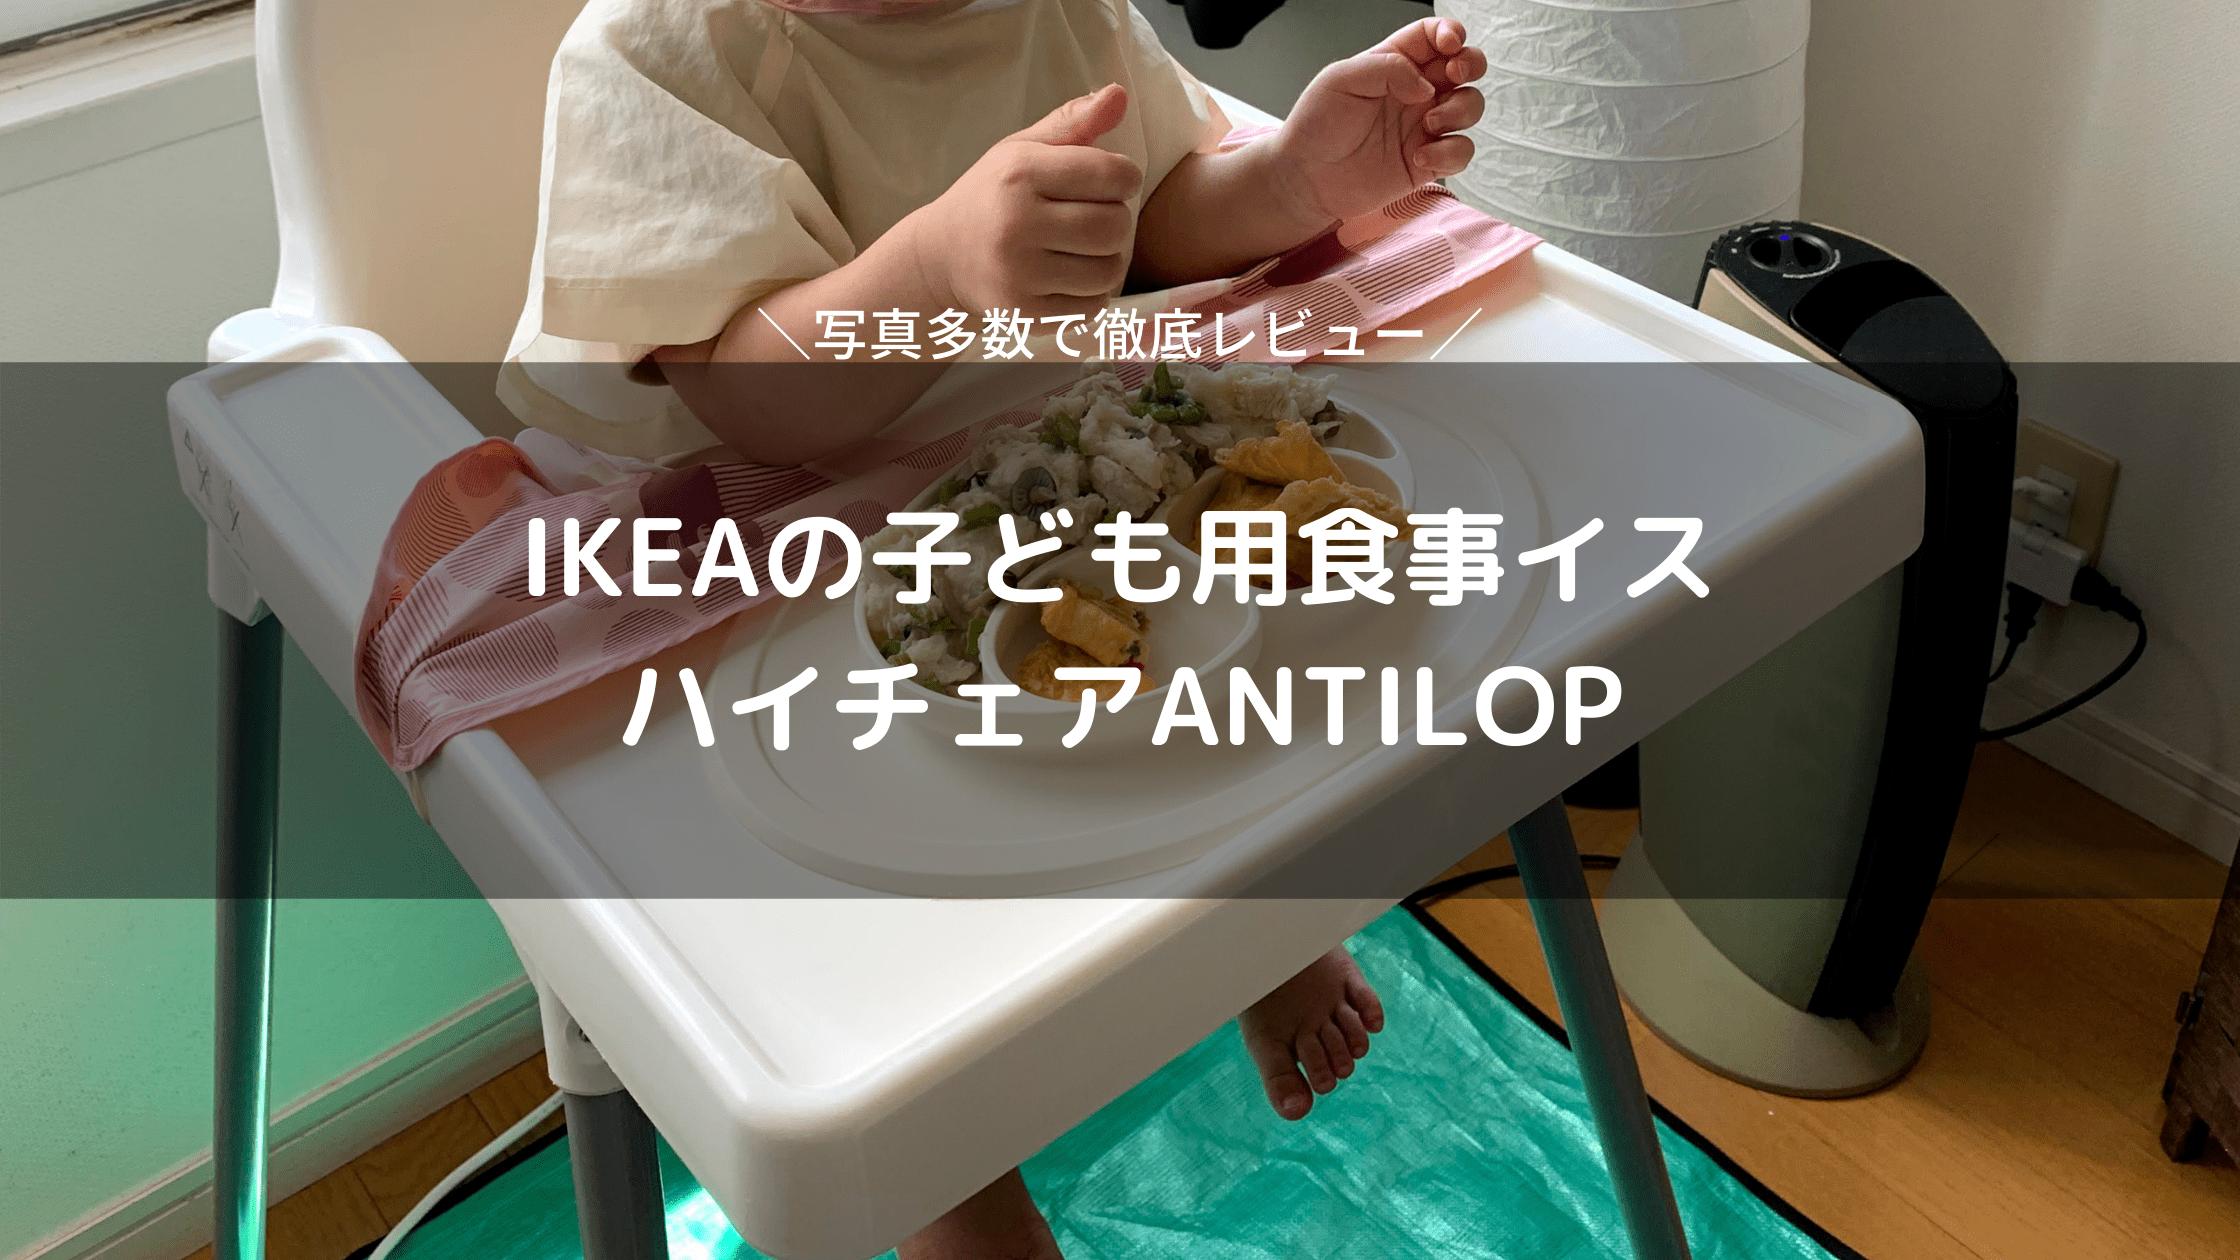 IKEAのベビーチェア(ハイチェア)は子供が食事を食べ散らかしても安心!ササっと拭けるから便利